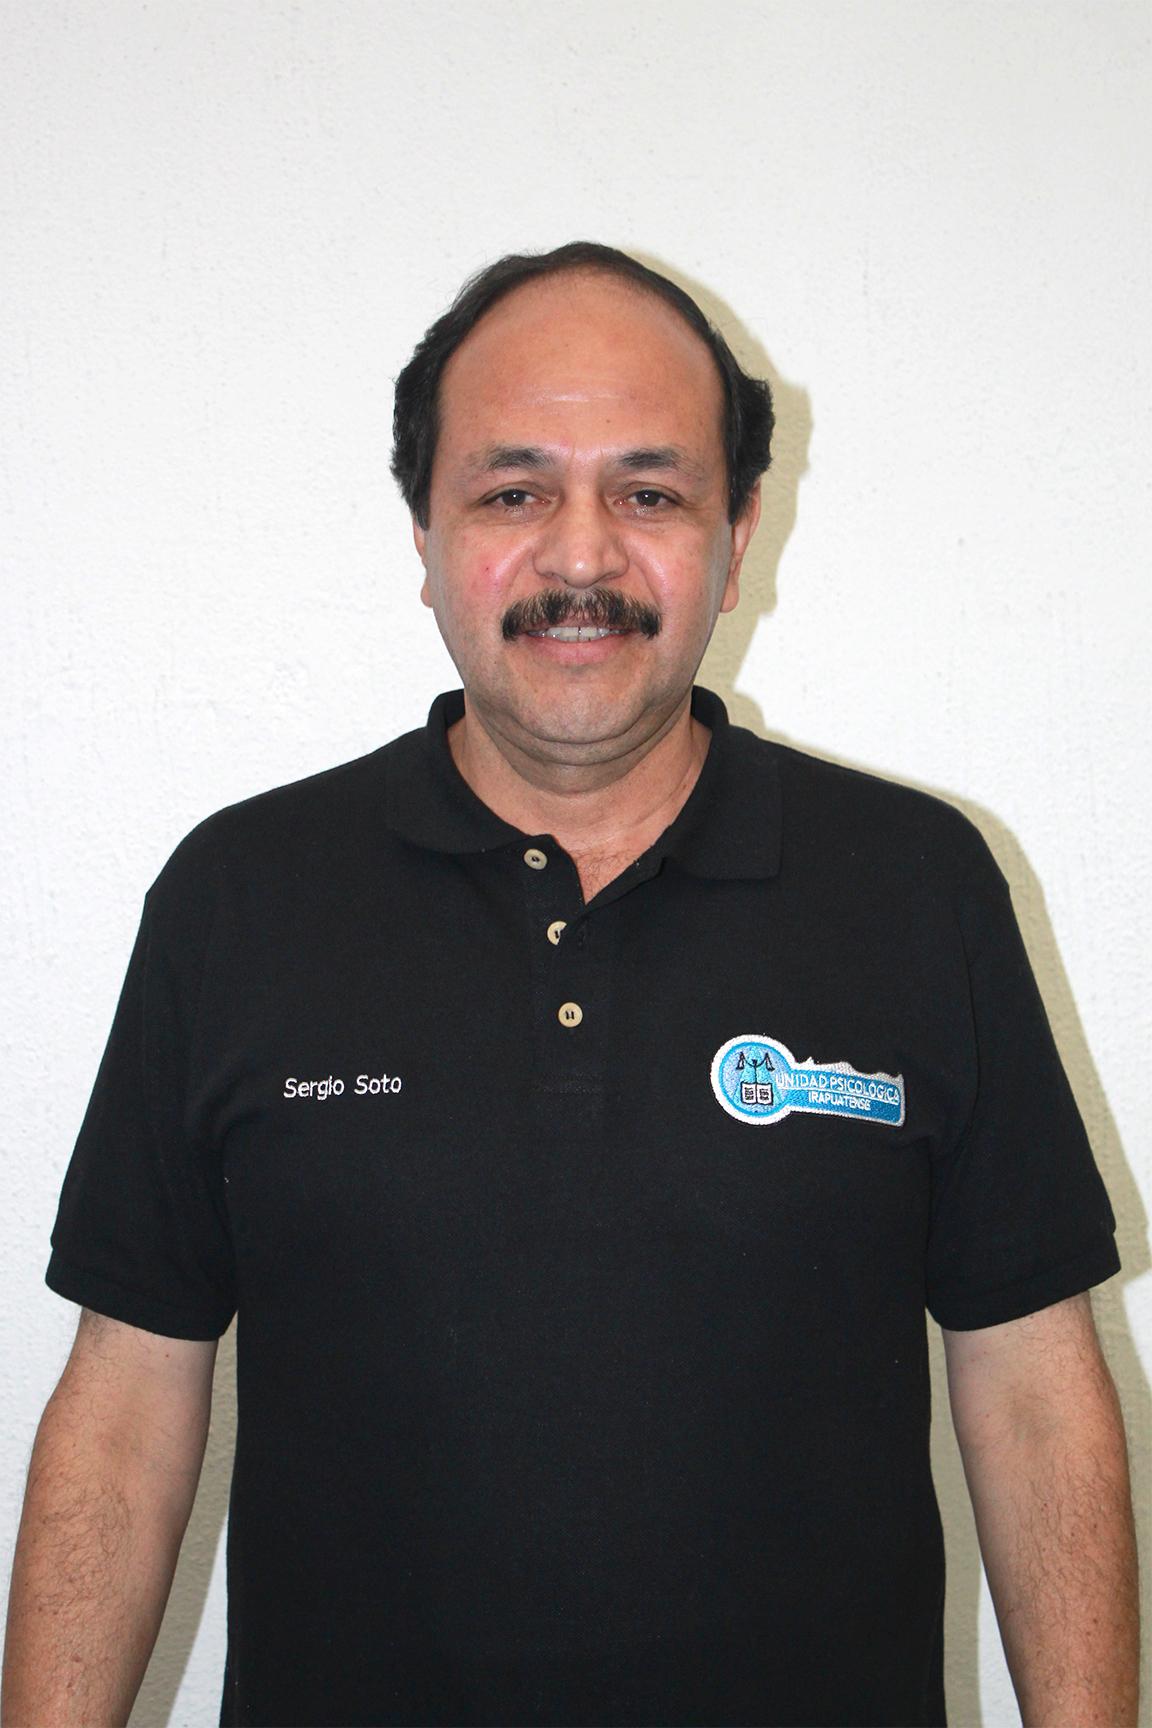 Sergio Soto Mariscal